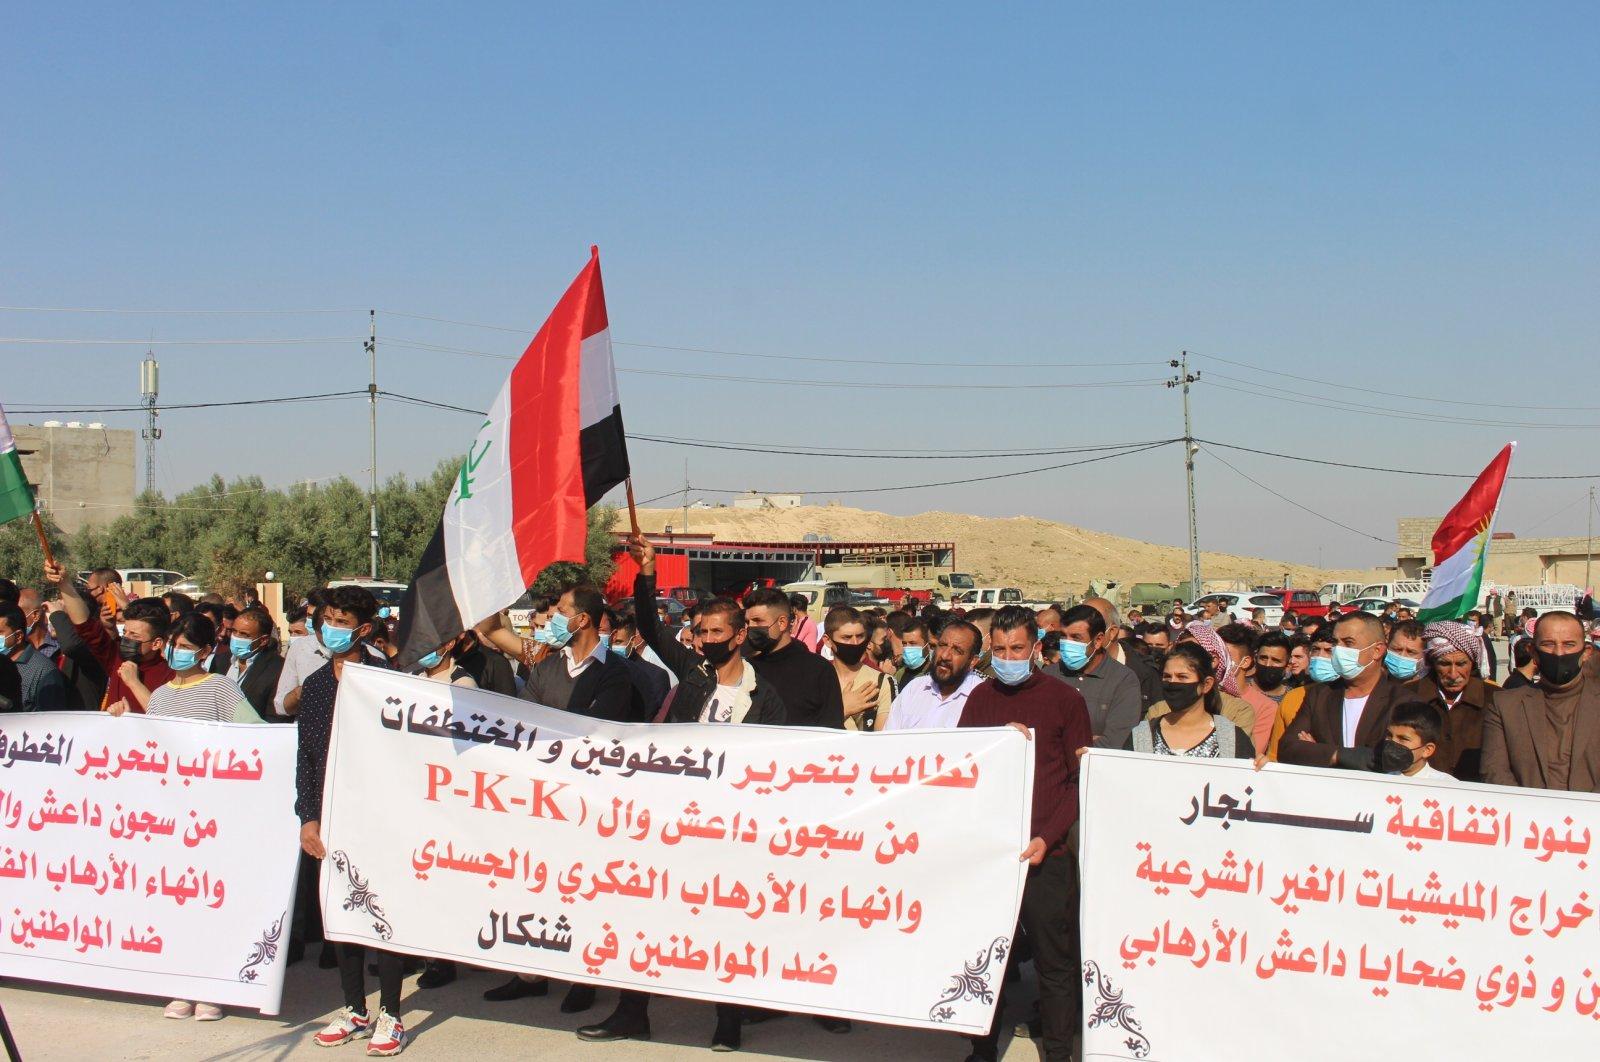 Yazidi people protest the PKK terrorist group's child recruitment, displacement policies in Sinjar, northern Iraq, Nov. 8, 2020 (AA Photo)